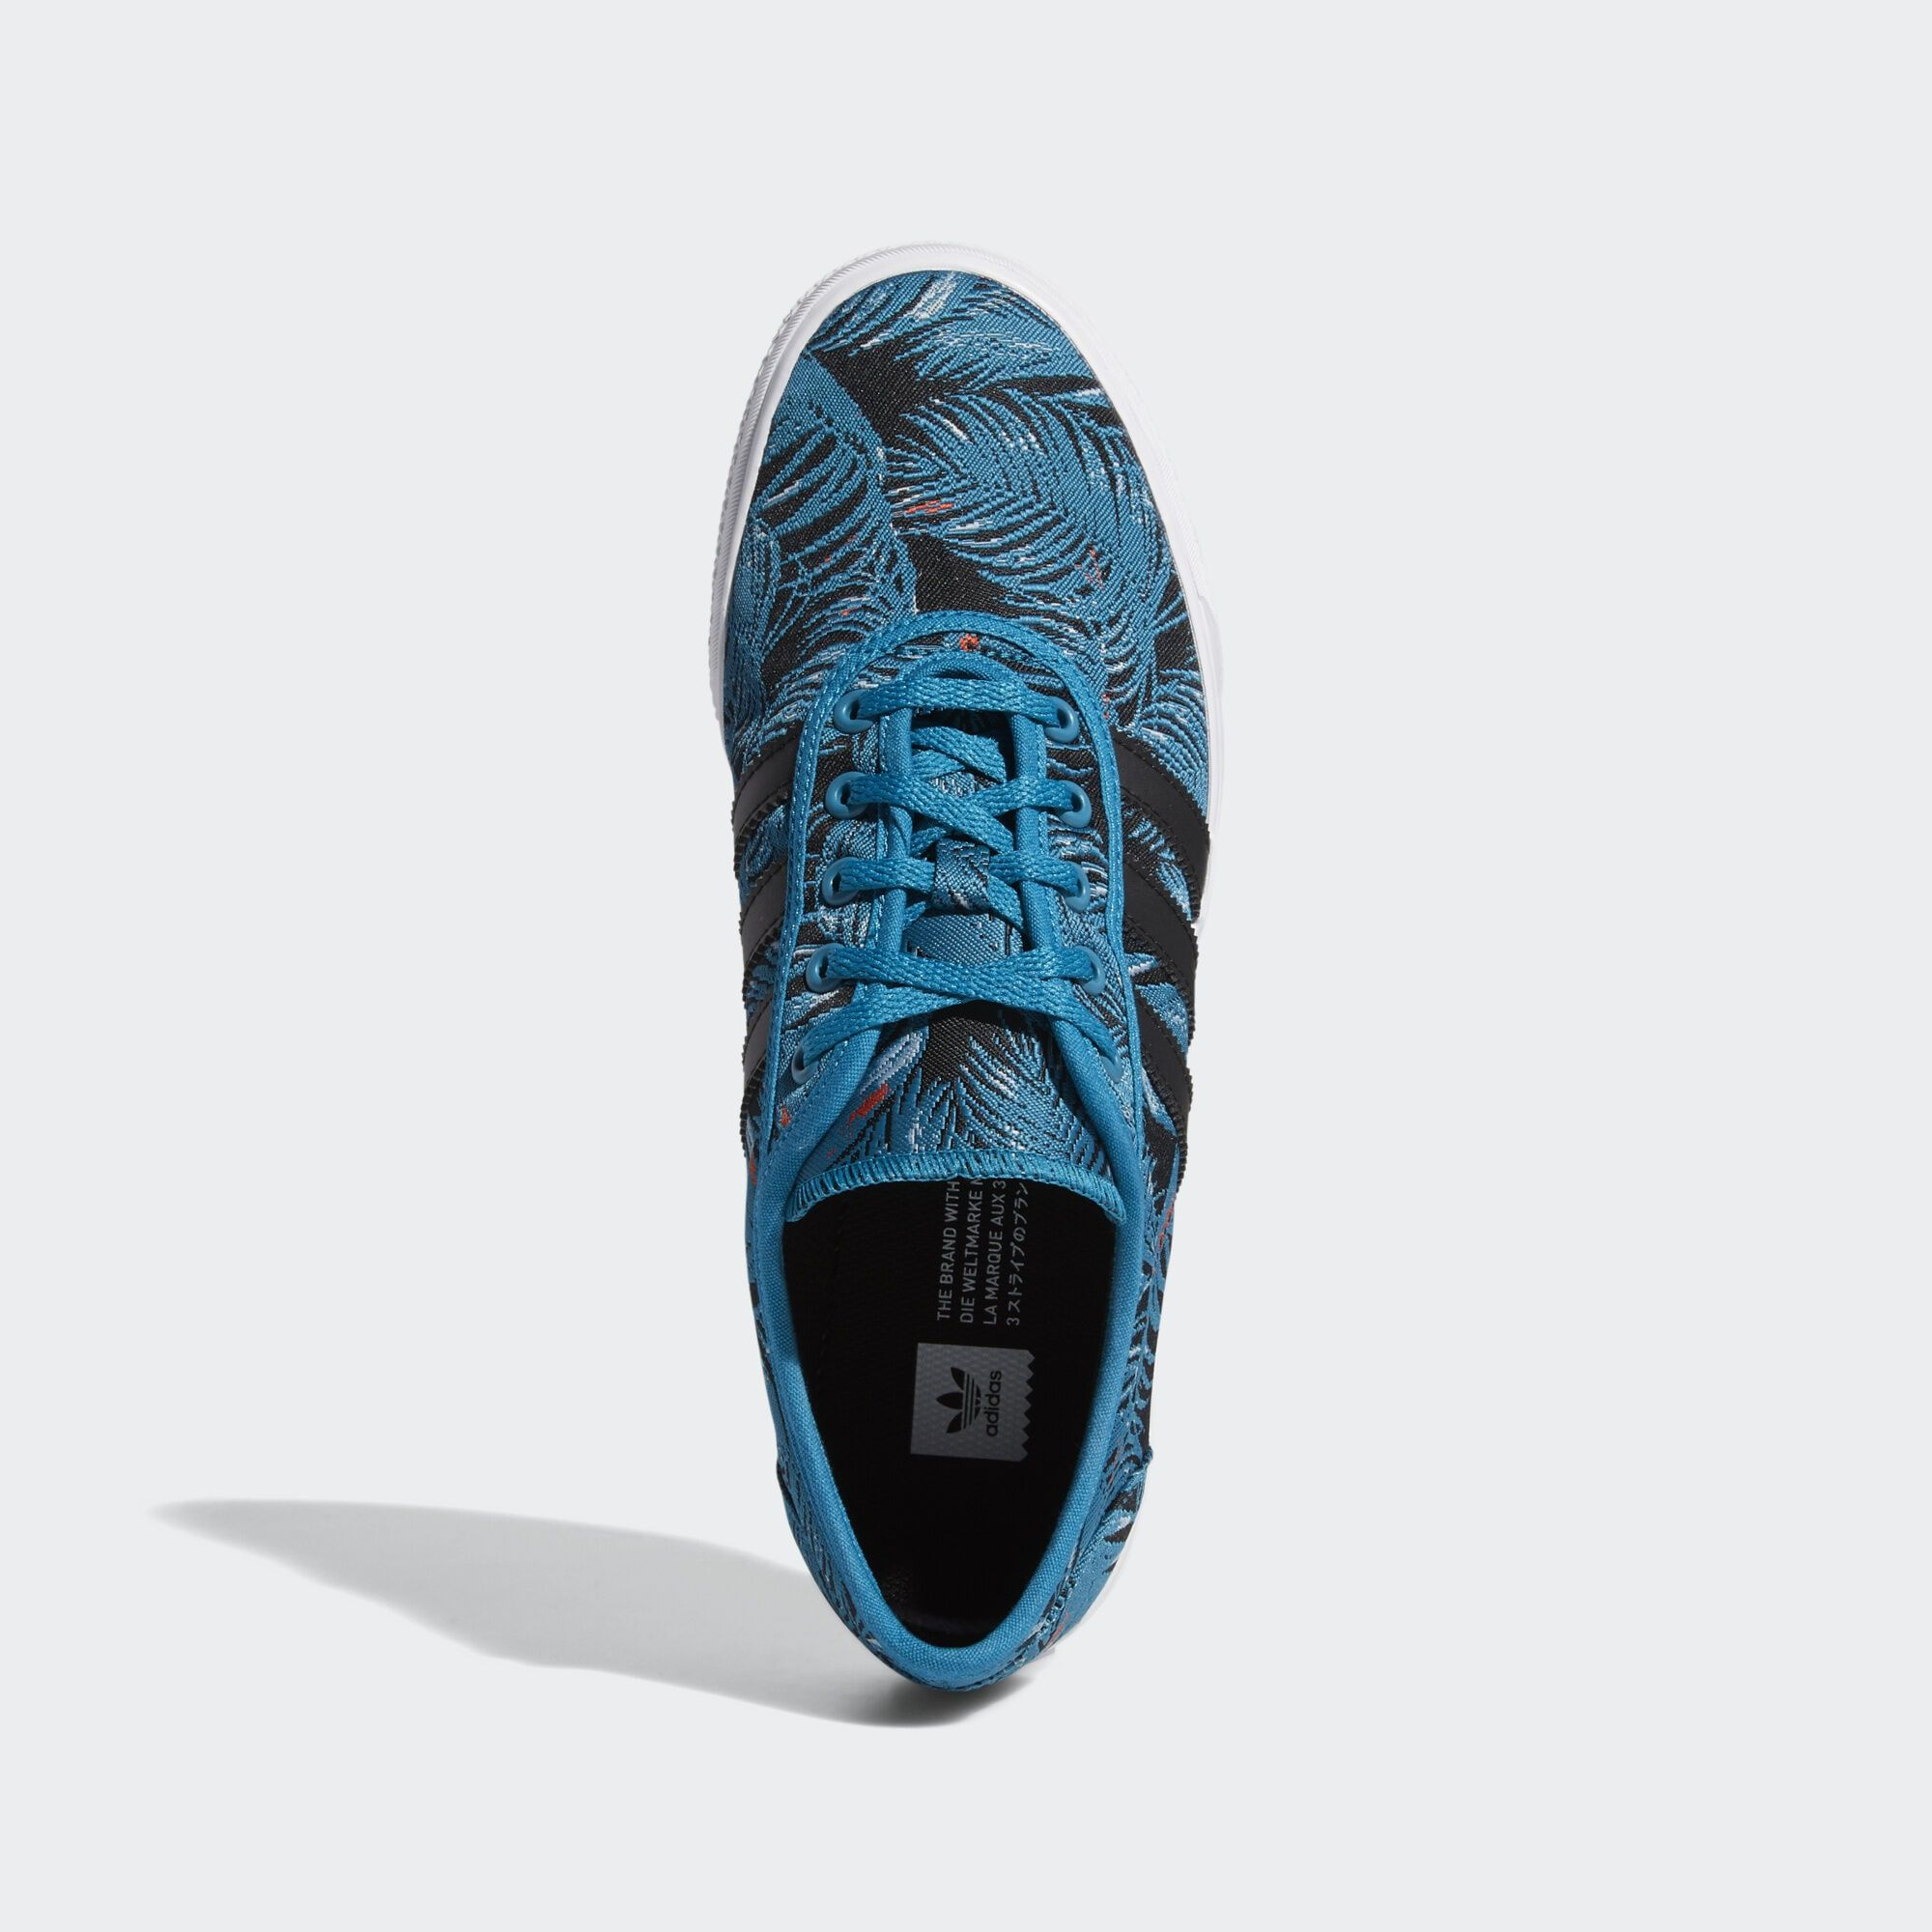 ADIDAS ORIGINALS Schuh 'Adiease' in blau / schwarz | Adidas ...